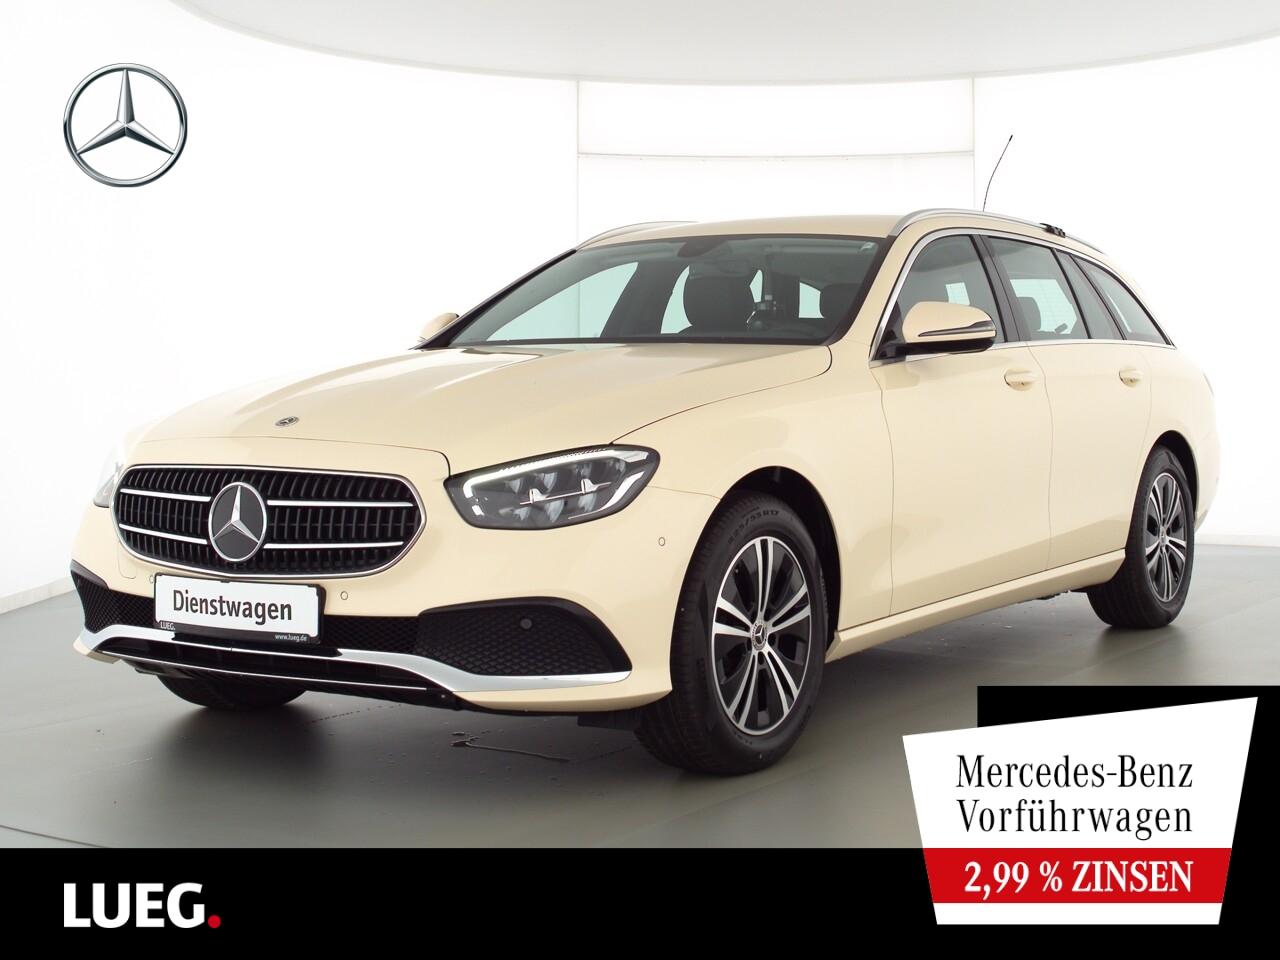 Mercedes-Benz E 200 d T ''Das TAXI'' AVANTGARDE+TAXAMETER+KAM, Jahr 2021, Diesel